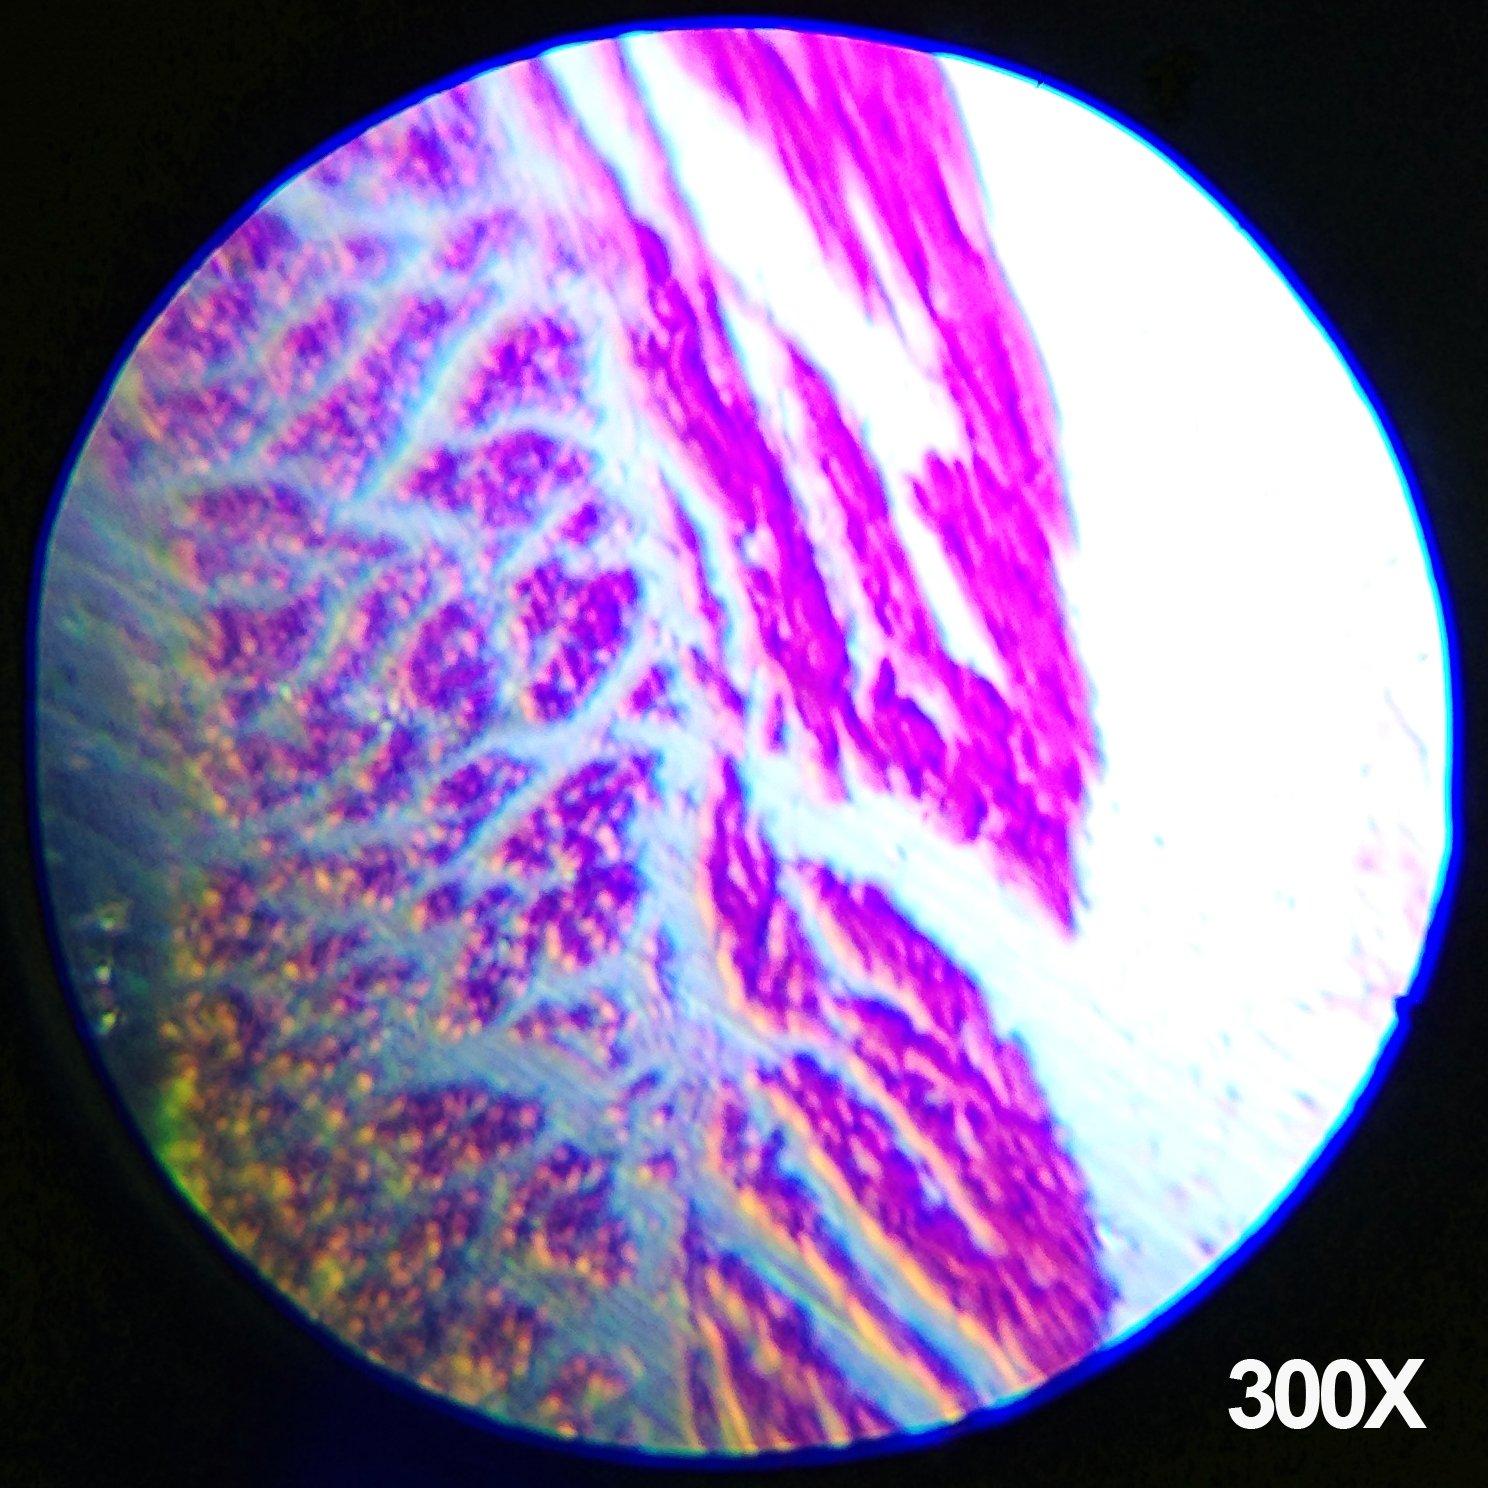 AmScope-Kids M30-ABS-KT1-W-I 120X-240X-300X-480X-600X-1200X 48pc Metal Arm & Base Educational Kids Biological Microscope Kit by AmScope (Image #5)